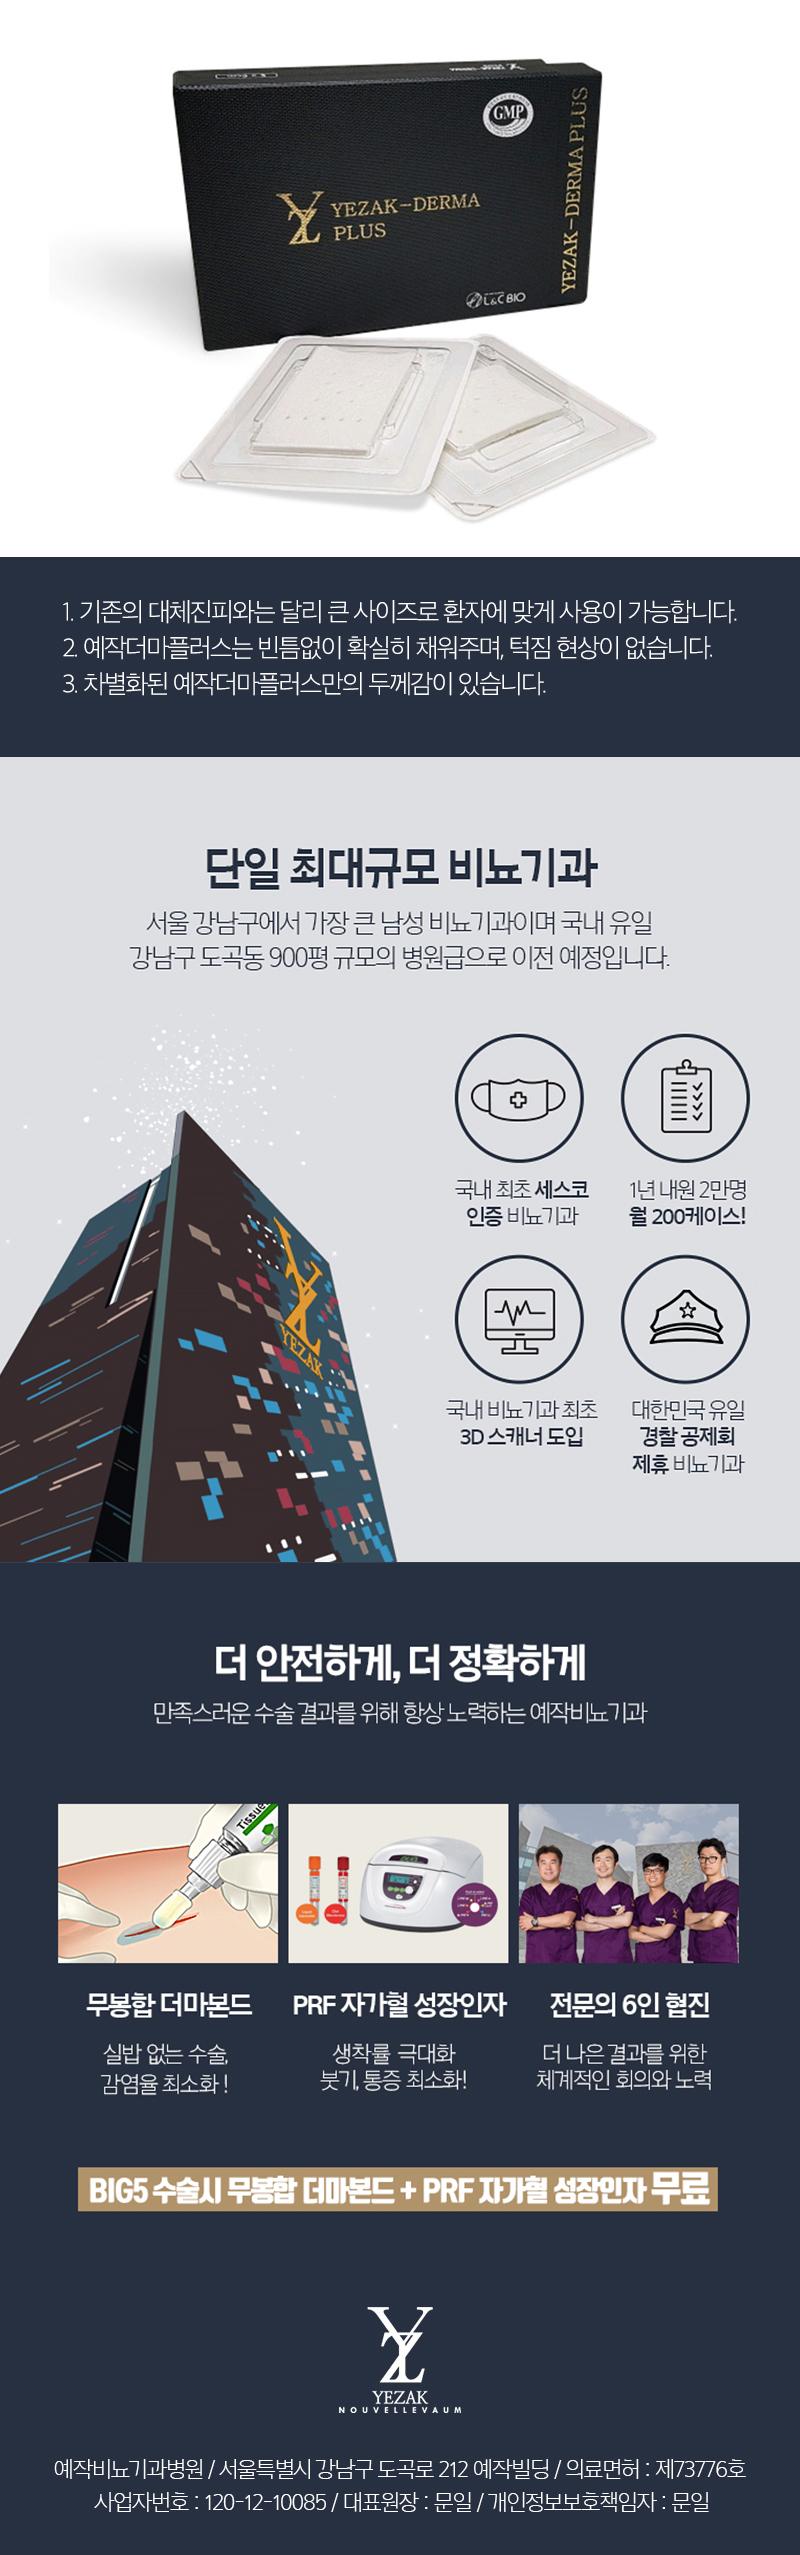 D event info 9fd942c3c08c884270